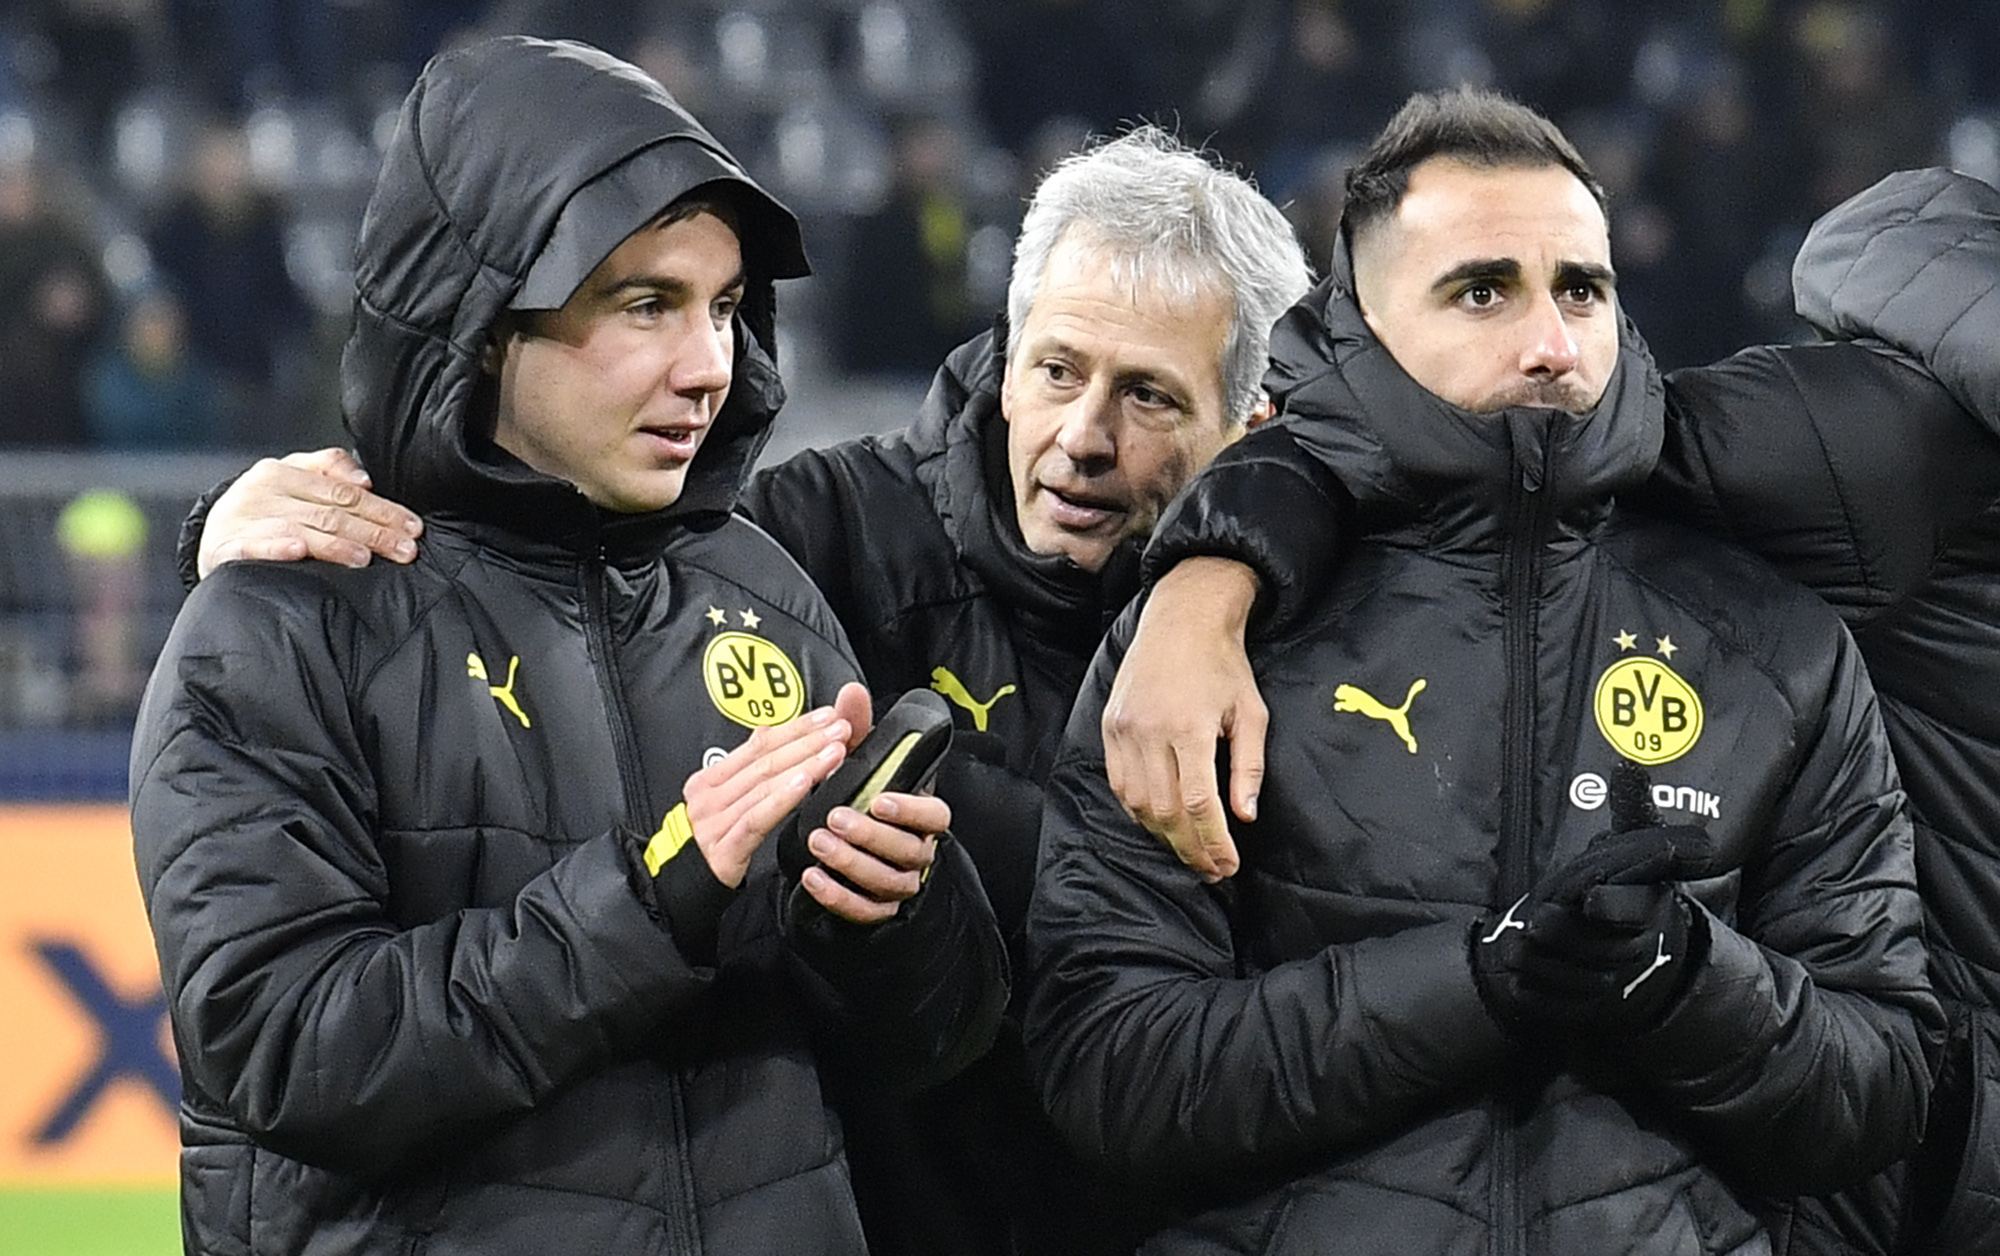 Villarreal signs Alcácer from Dortmund in record deal